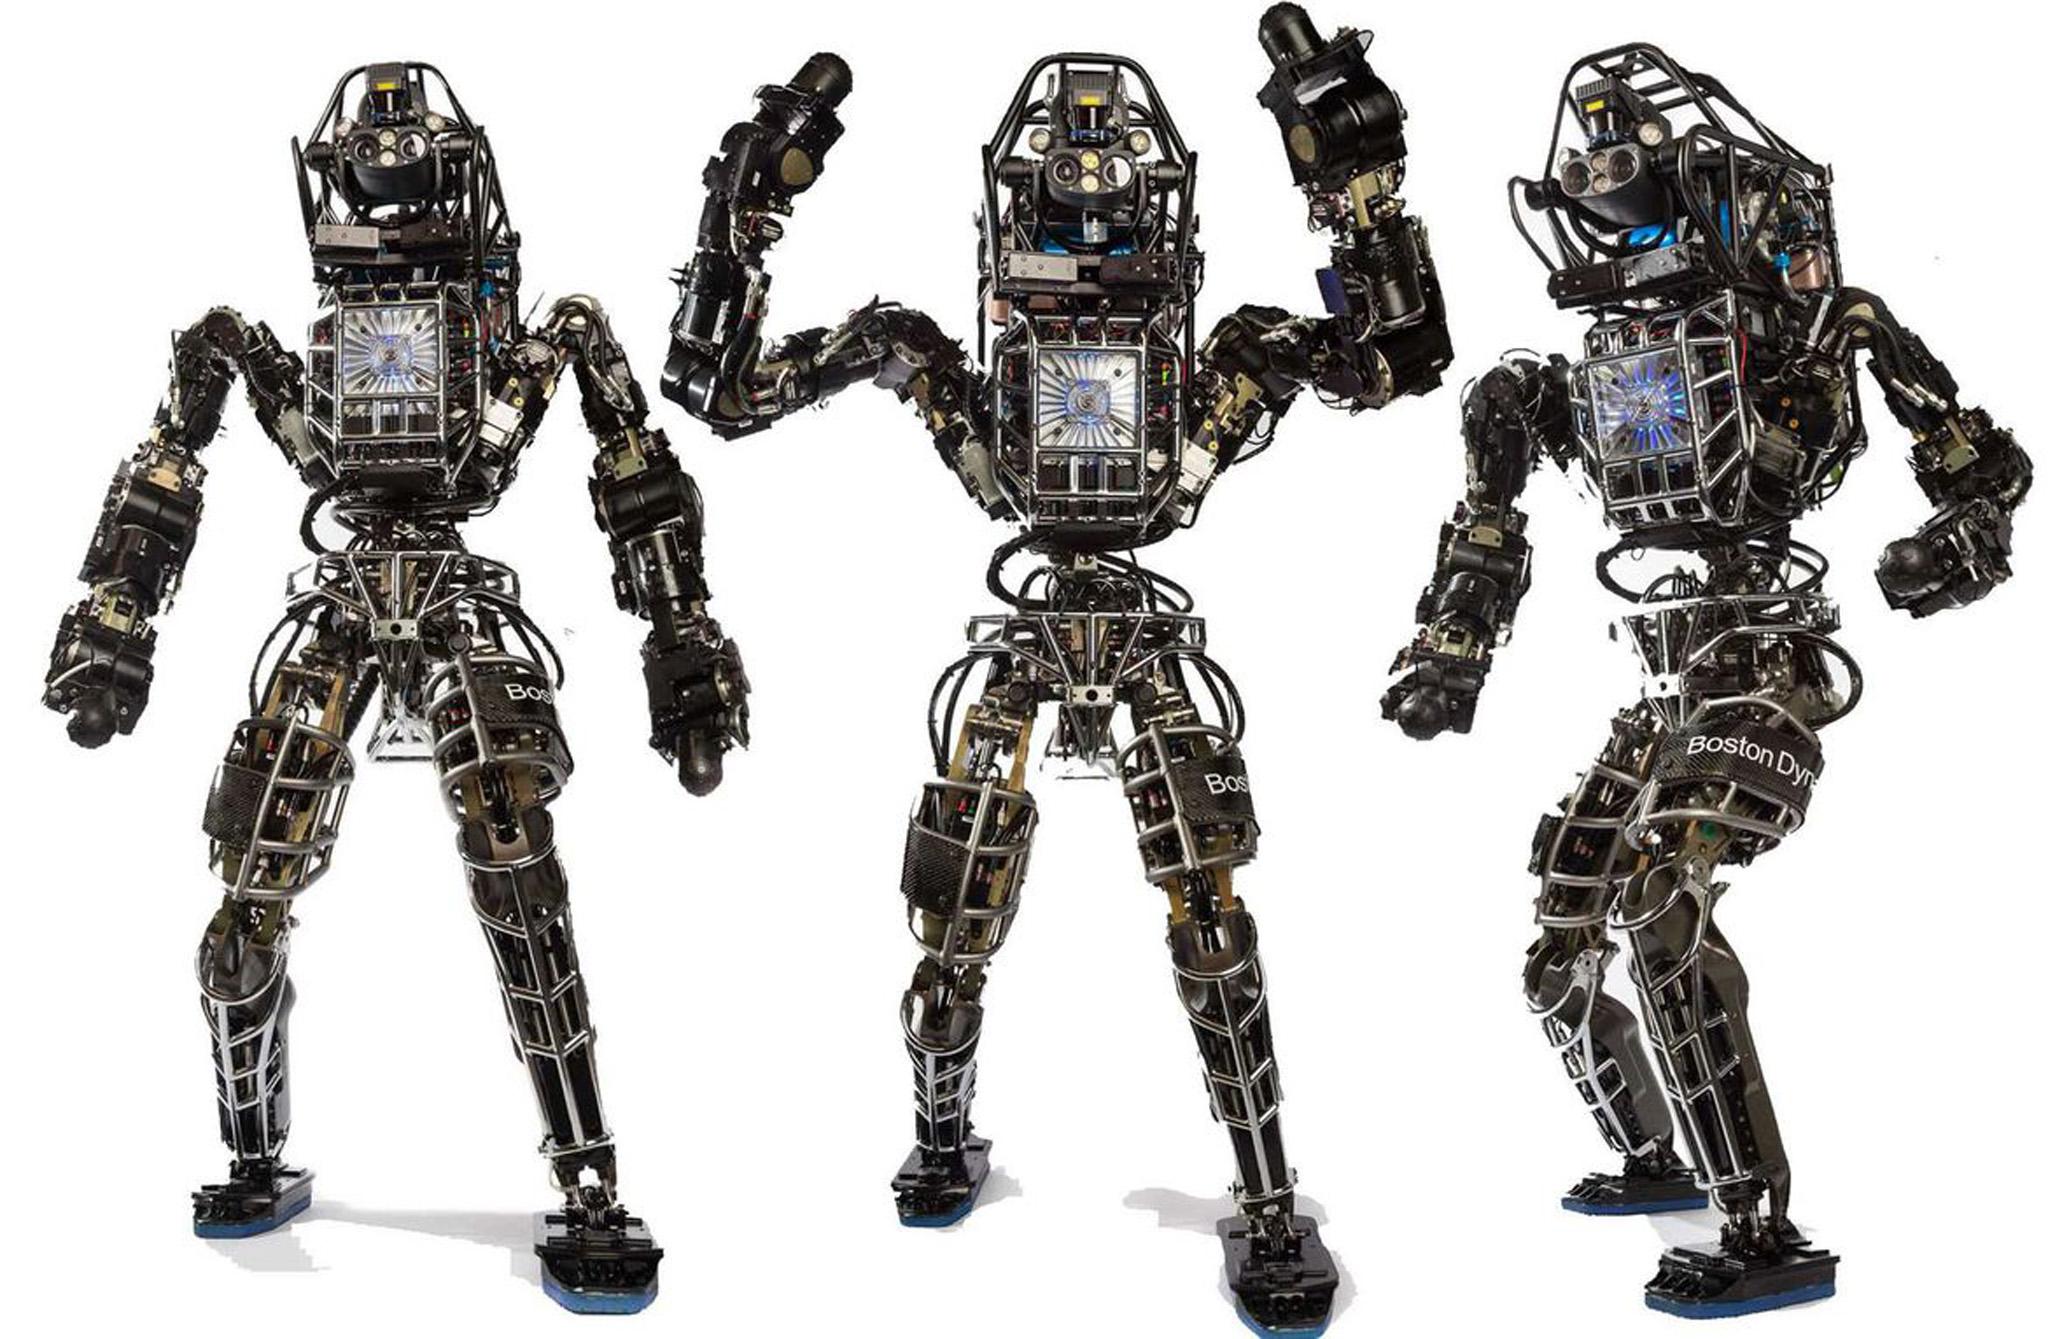 robot_quan_doi_My_Tinhte_2.jpg